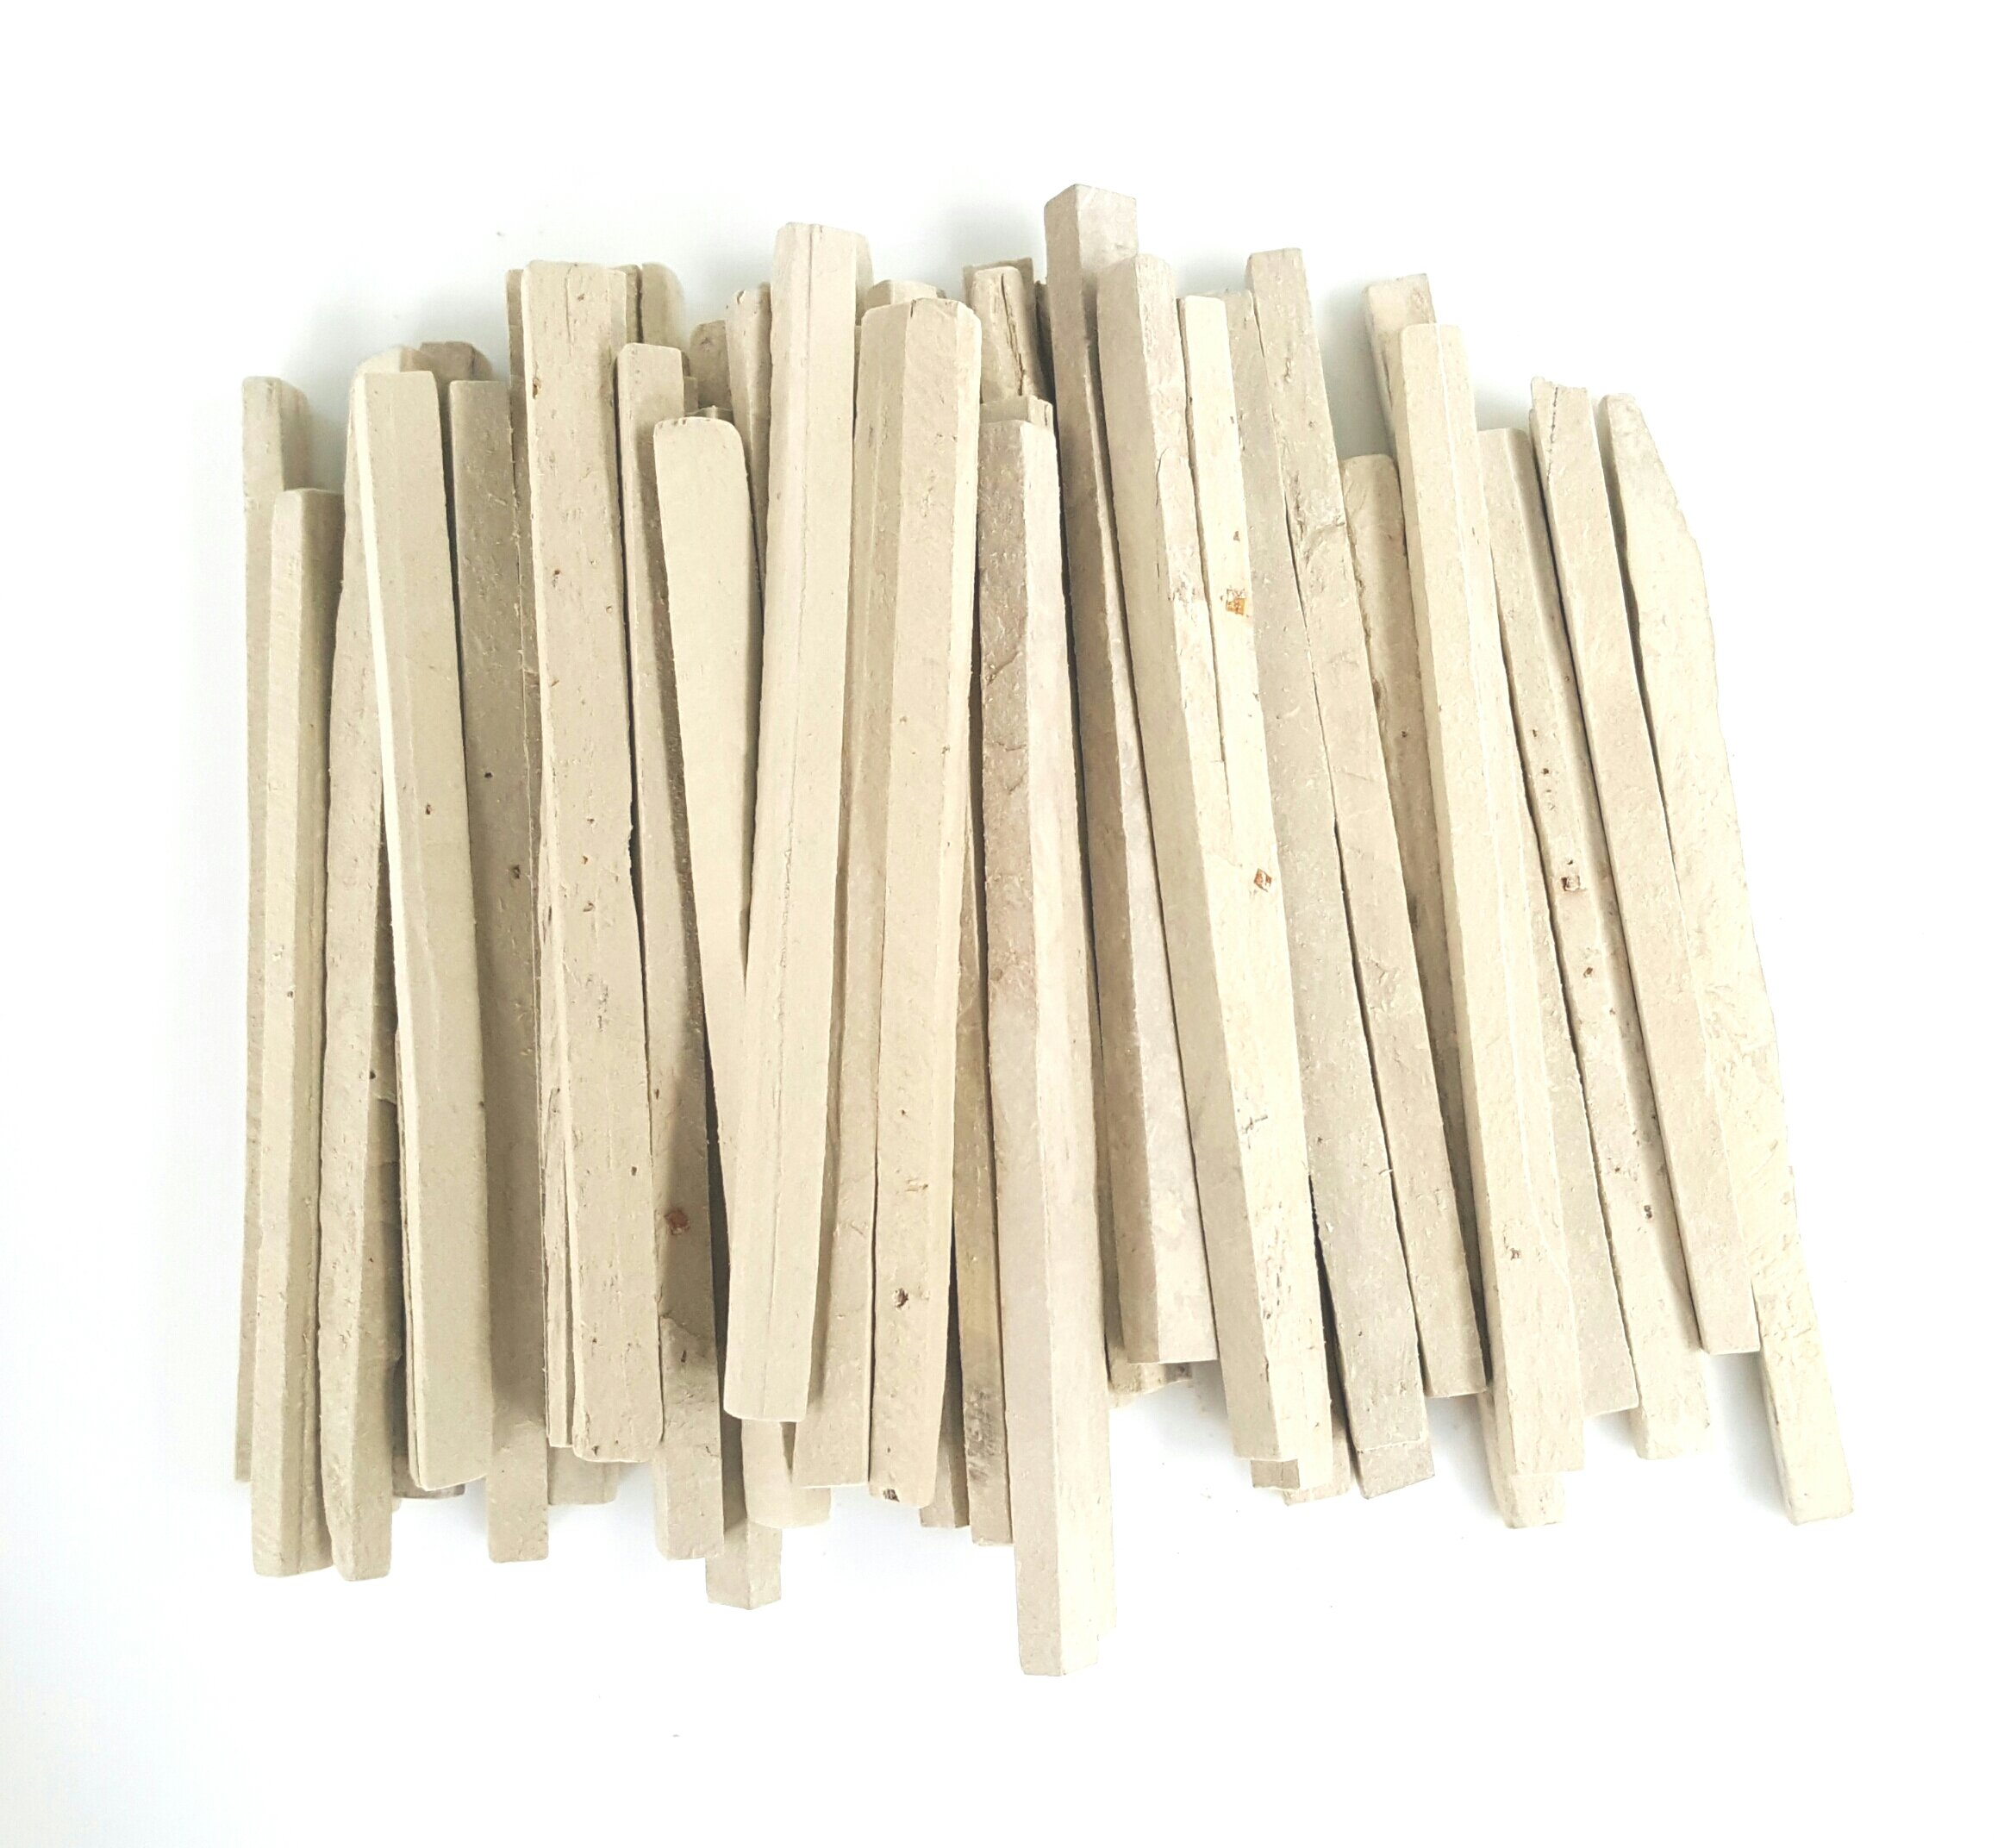 Rawsimple Slate Pencils 600 Pencils(3 Kilos) 12 x 50 Pencils Sets Dozen Carton Box Natural Stone Chalk Pencils